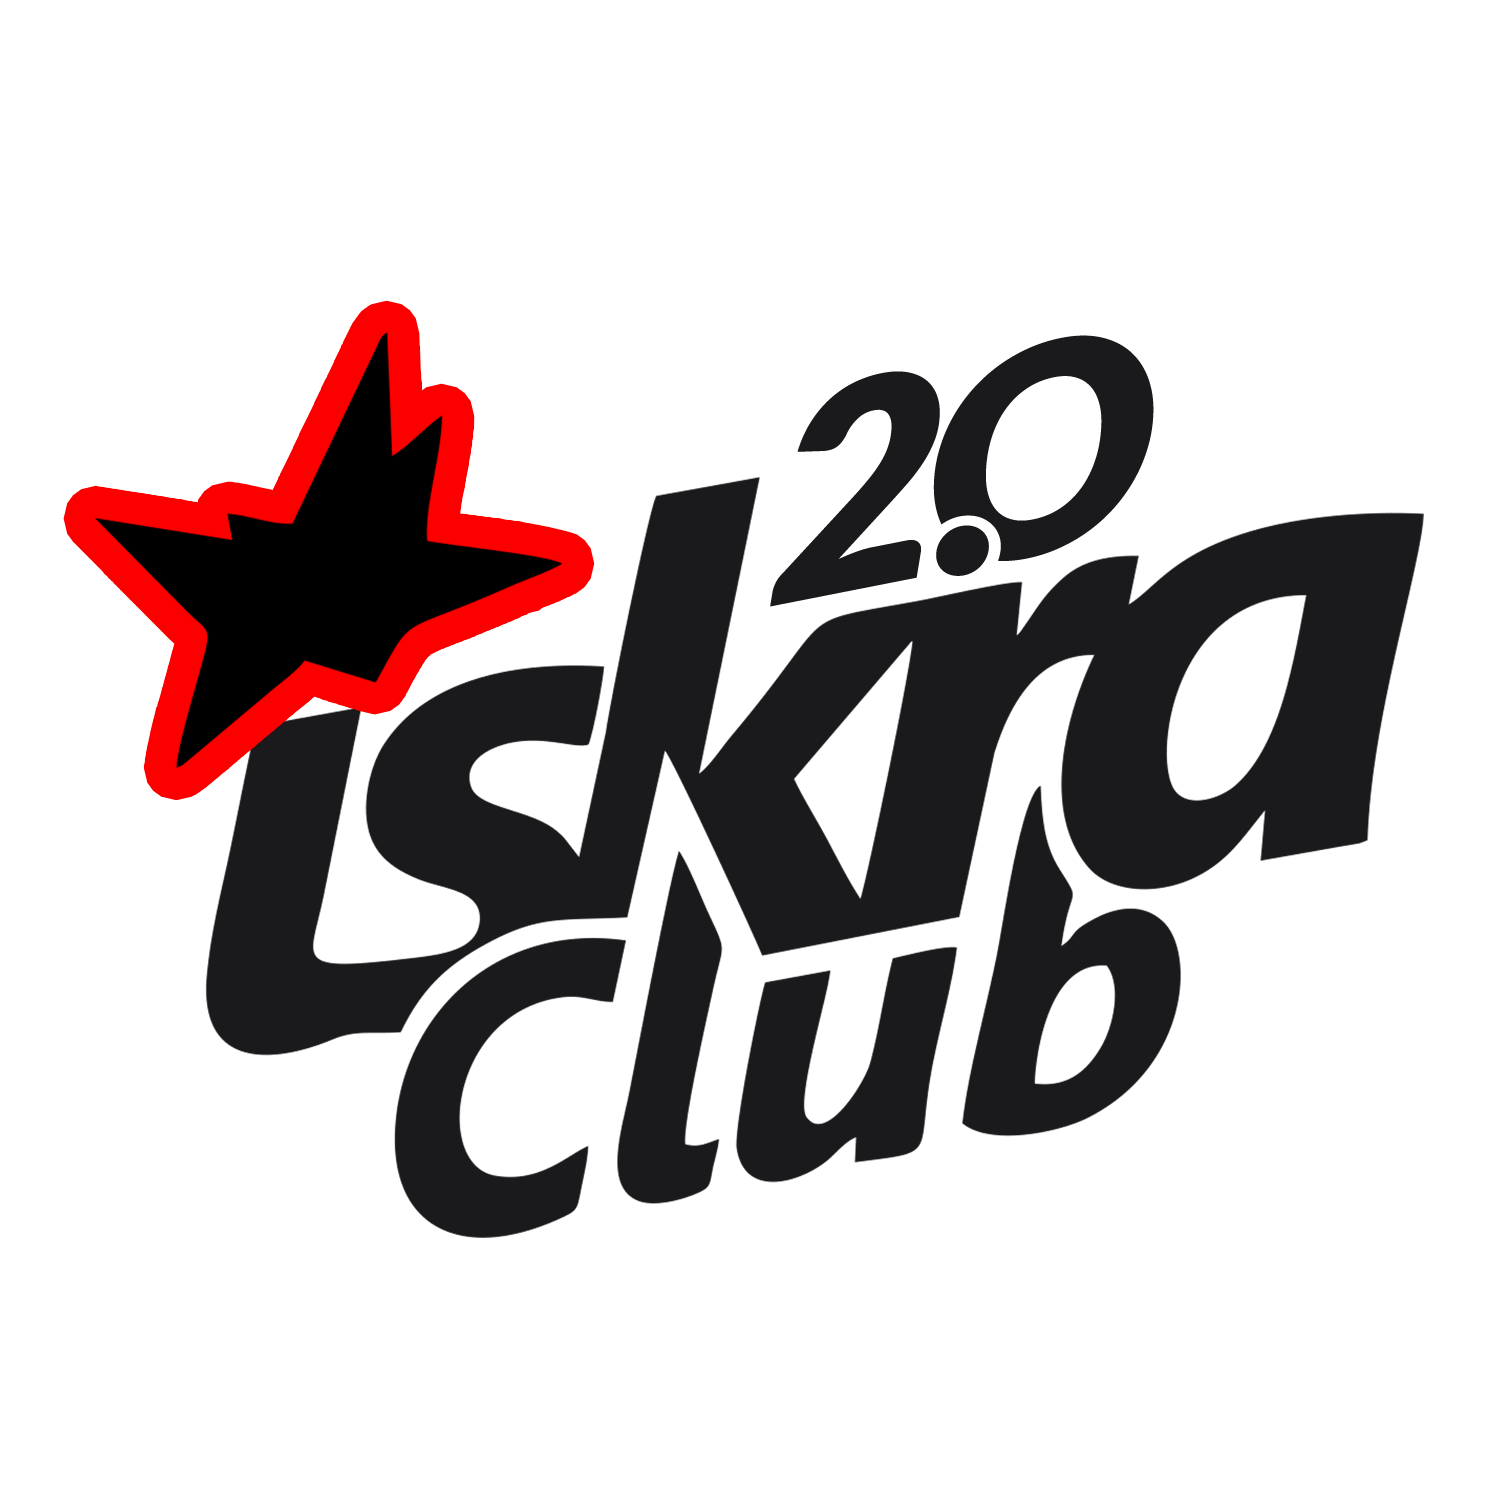 Iskra 2.0 - Augustów